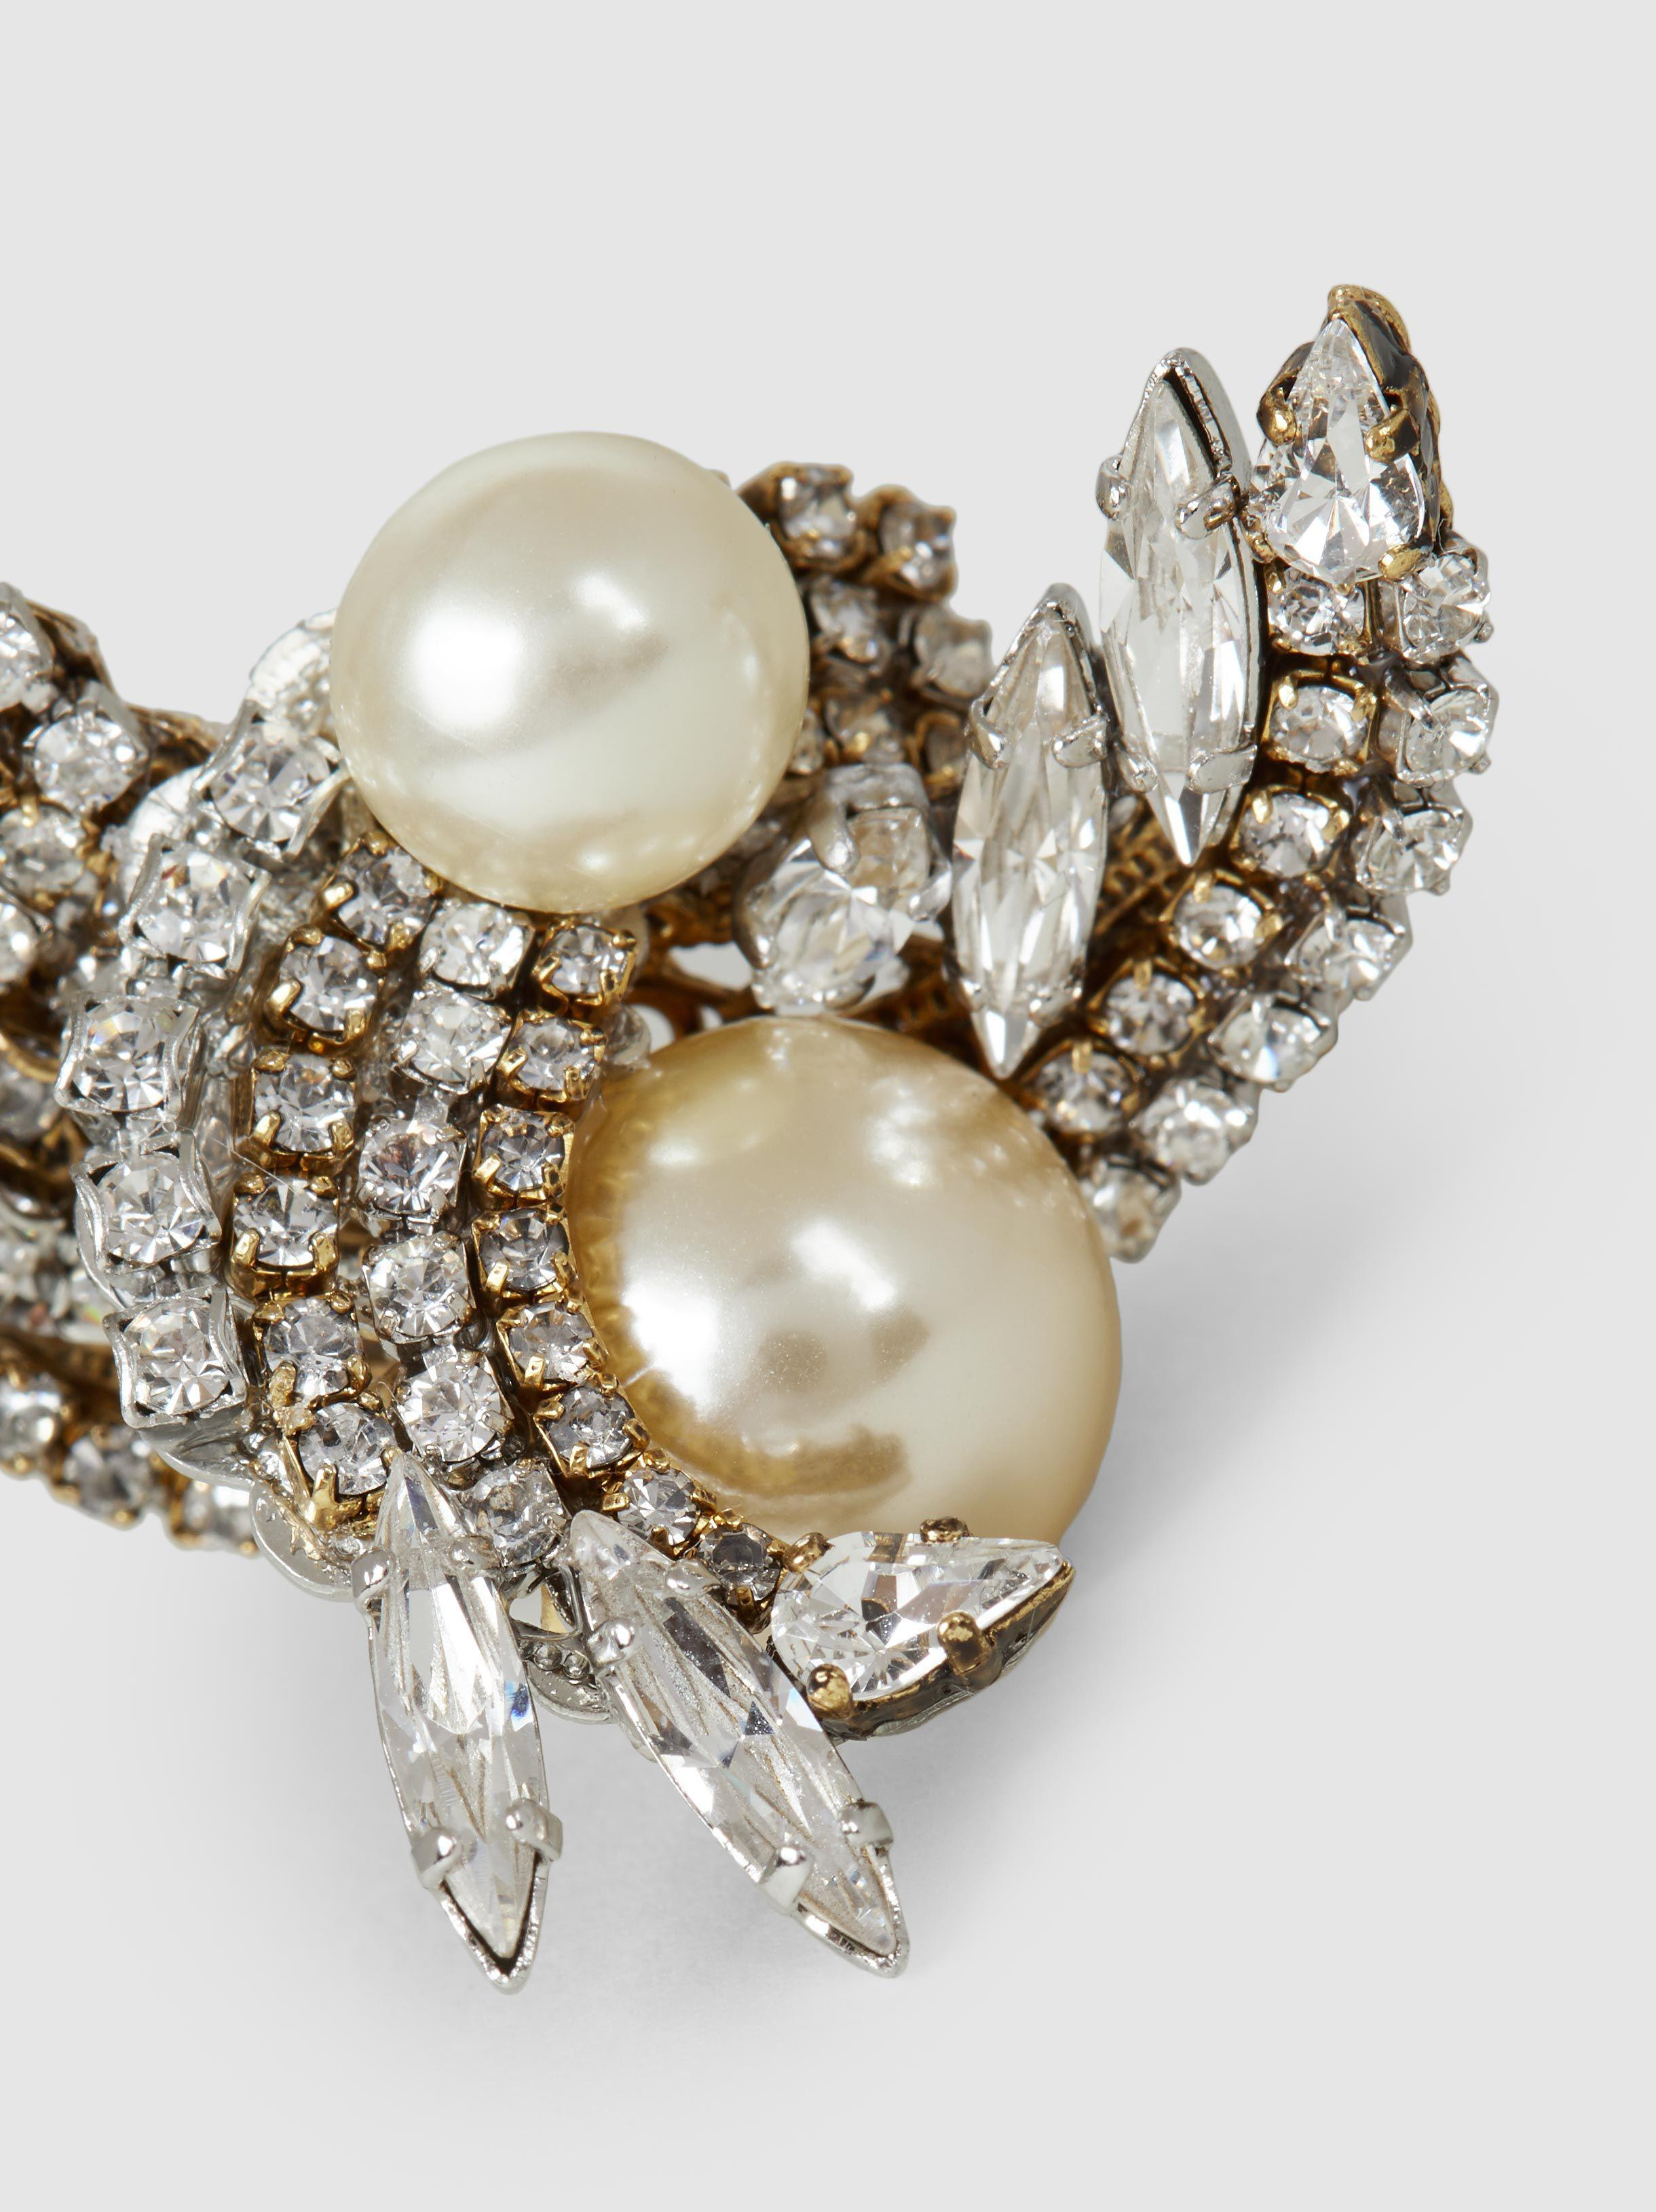 Erickson Beamon Delicate Balance Embellished Gold-Plated Earrings YIl5xH